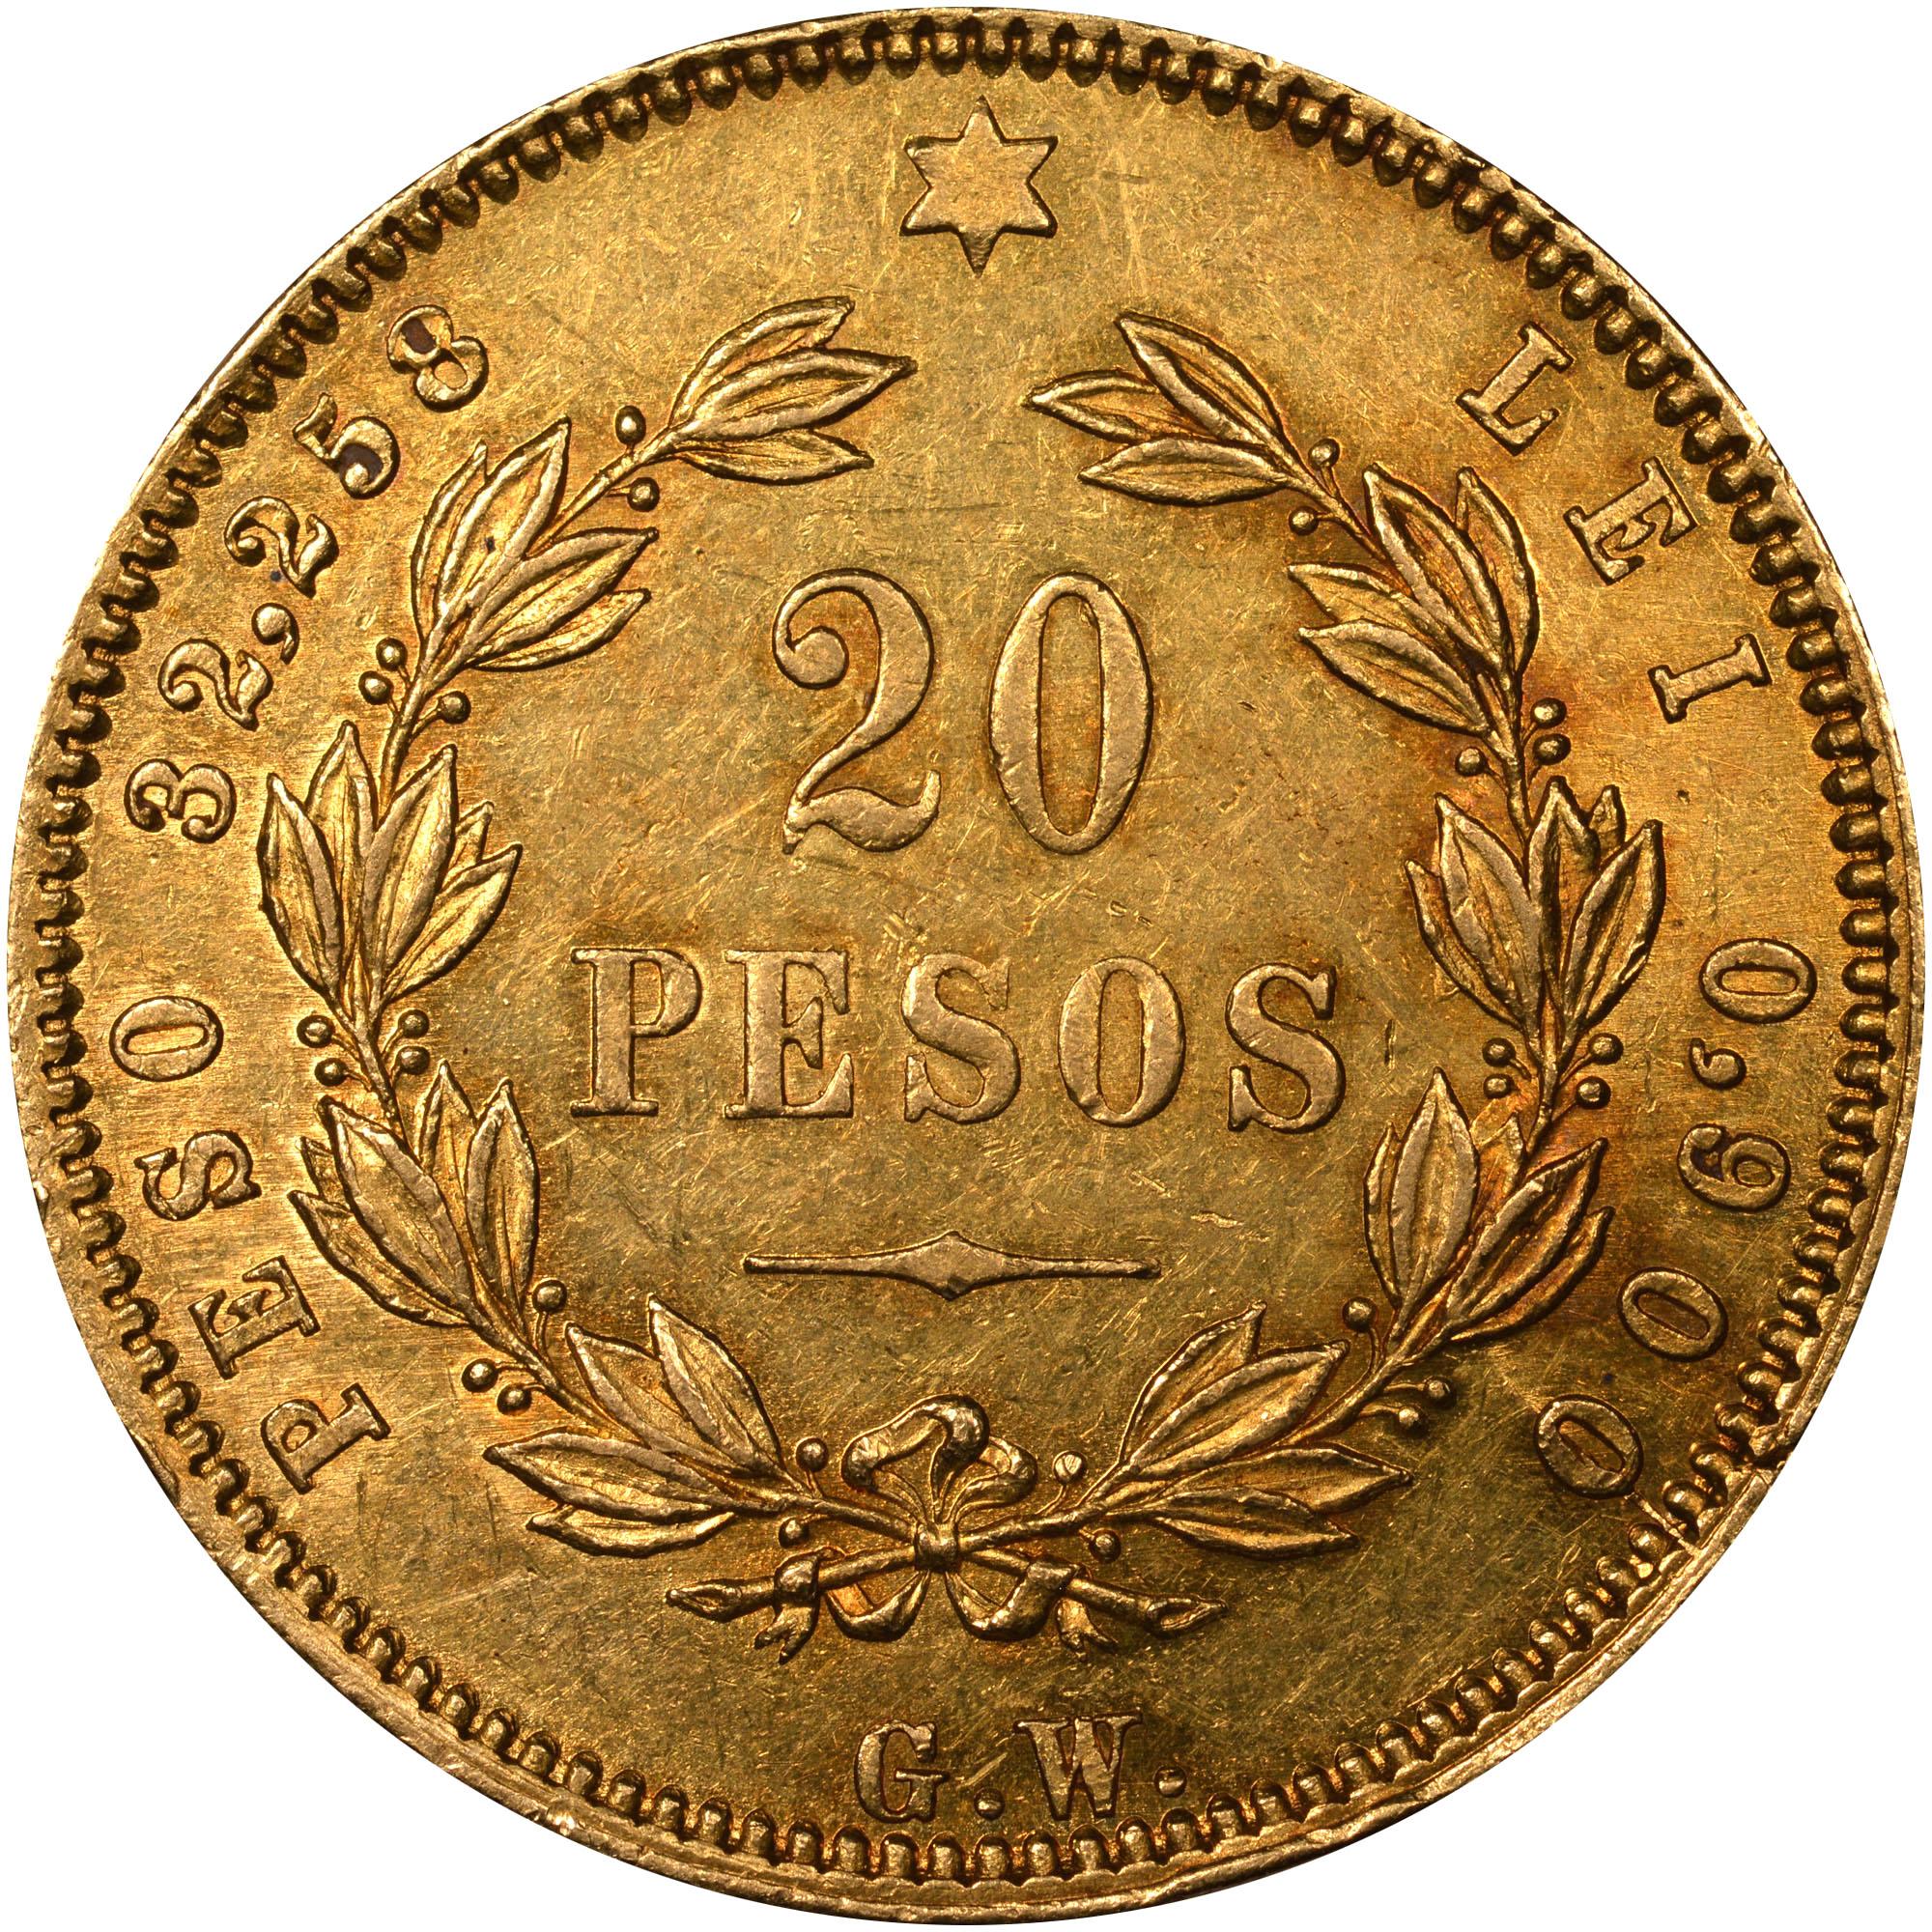 1873 Costa Rica 20 Pesos reverse